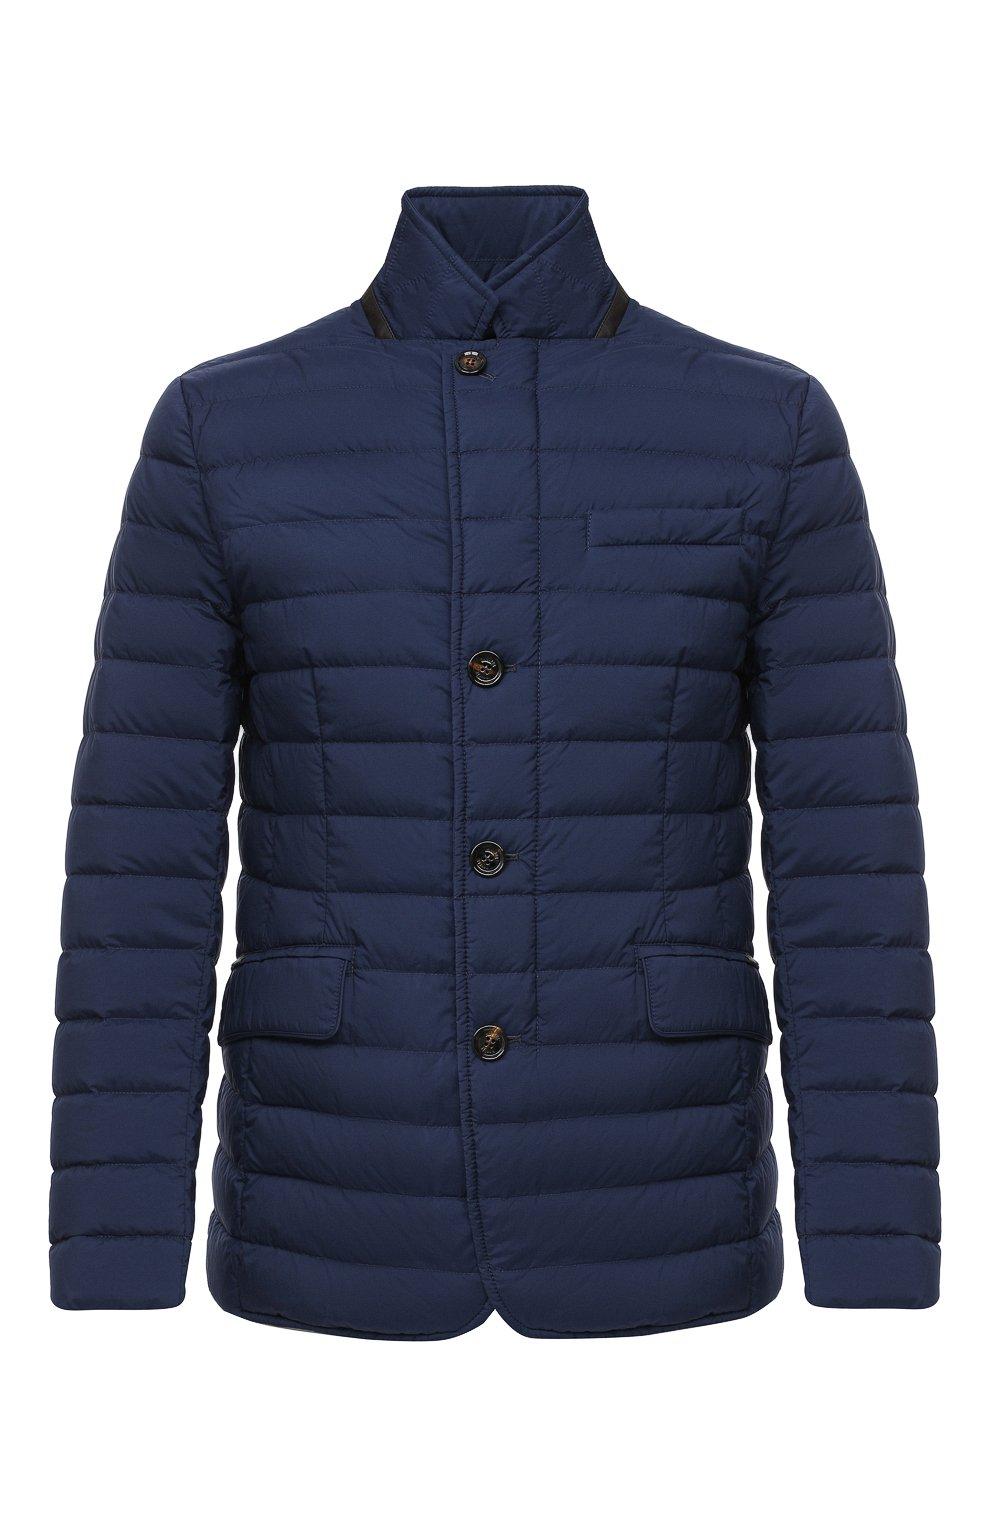 Мужская пуховая куртка zavyer-s3 MOORER синего цвета, арт. ZAVYER-S3/A20M360REFL   Фото 1